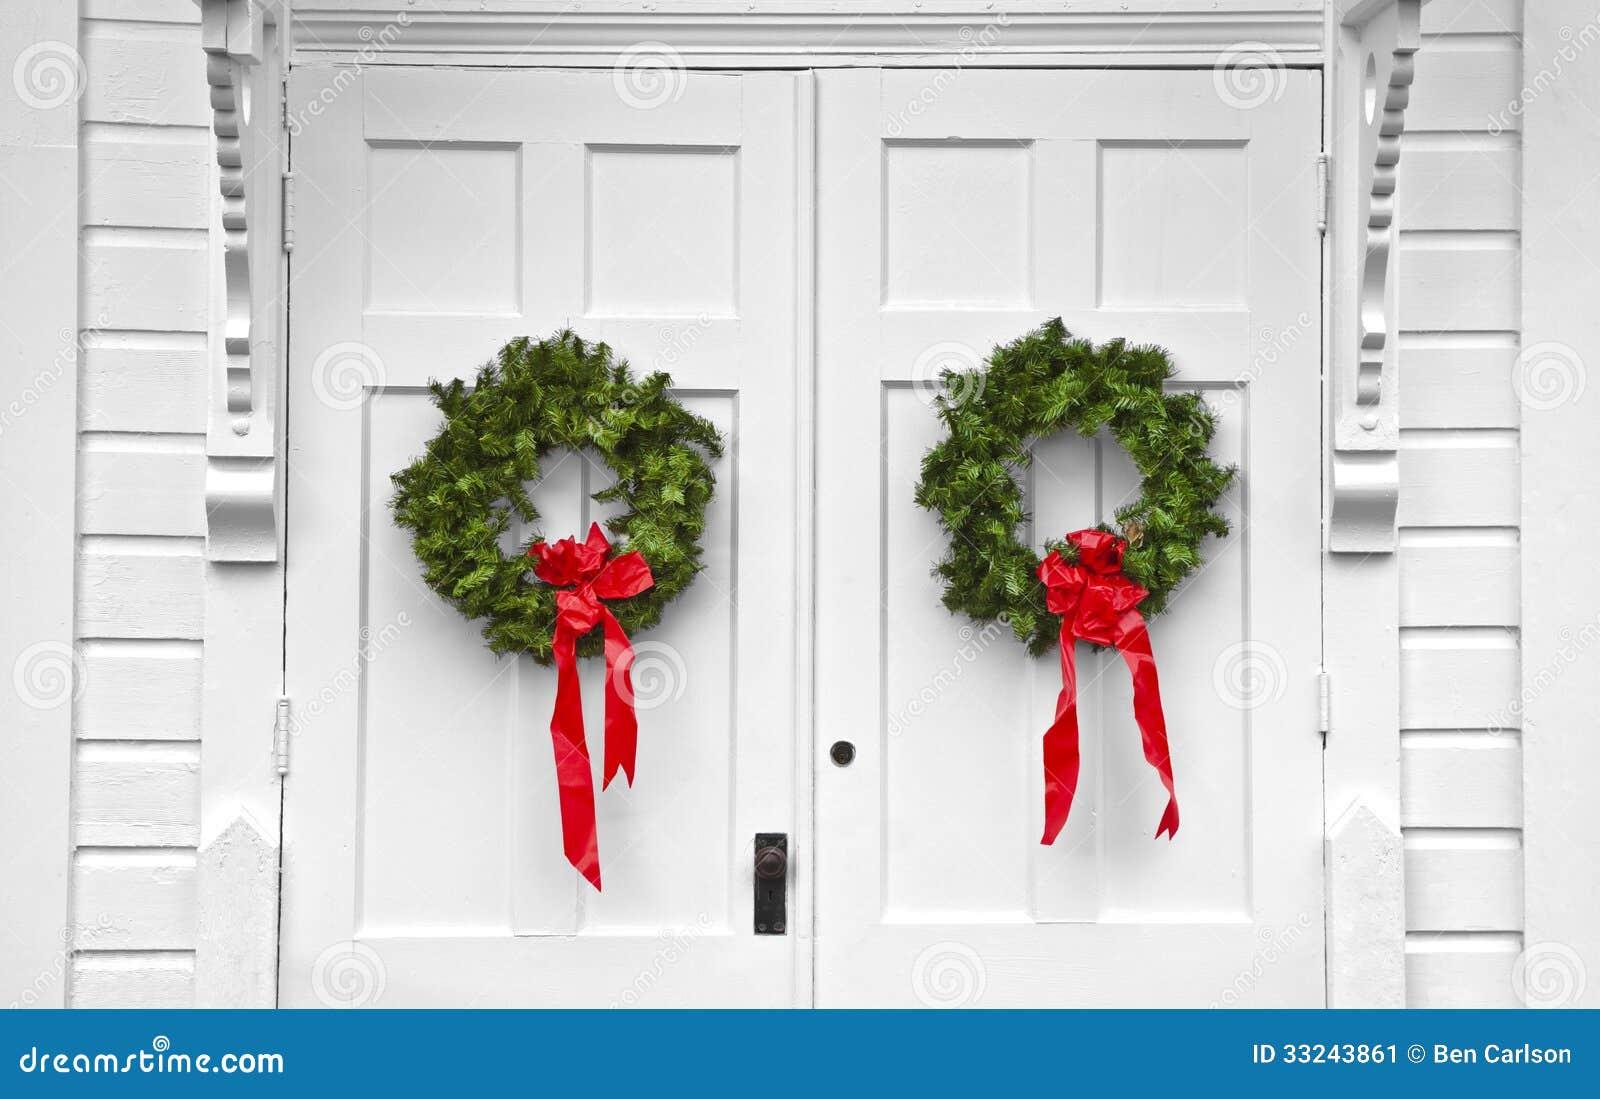 Church Double Door Christmas Wreaths Stock Image  Image